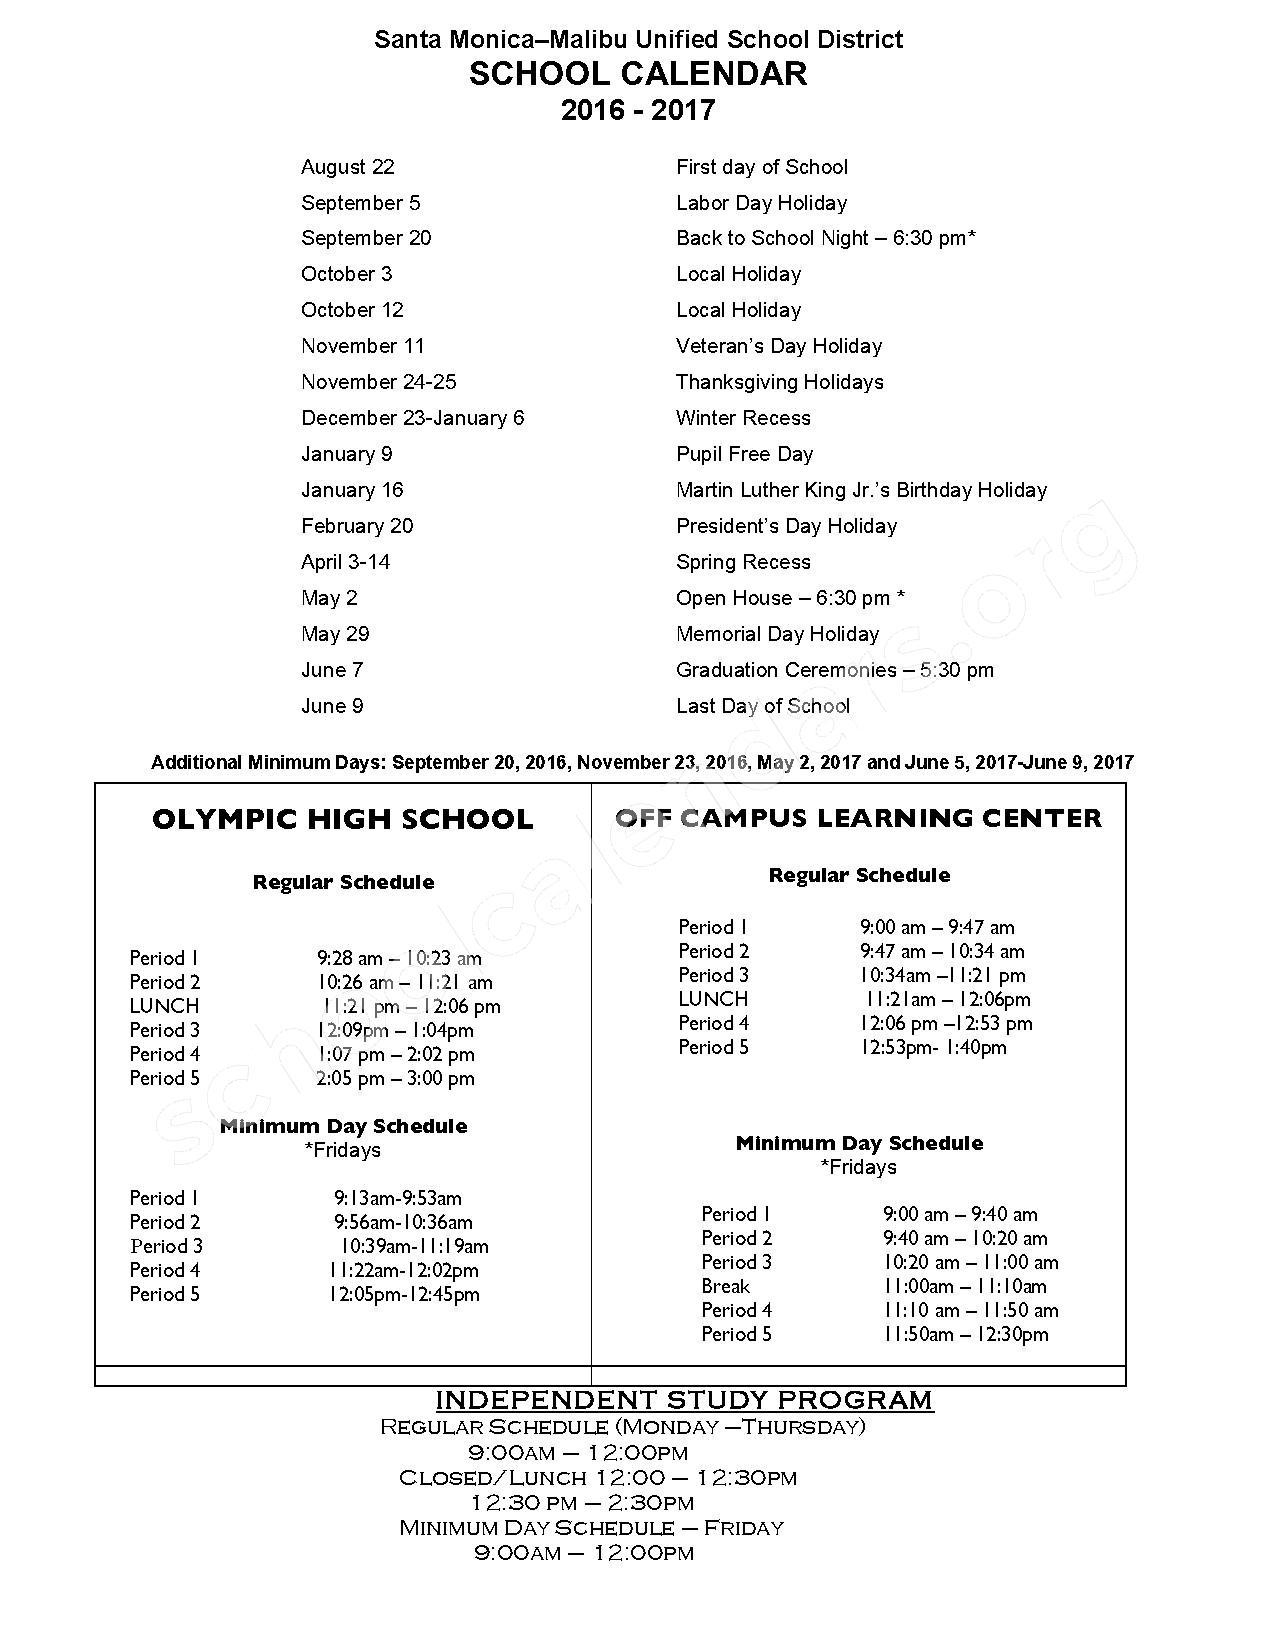 2016 - 2017 School Calendar – Santa Monica Alternative (K-8) – page 1